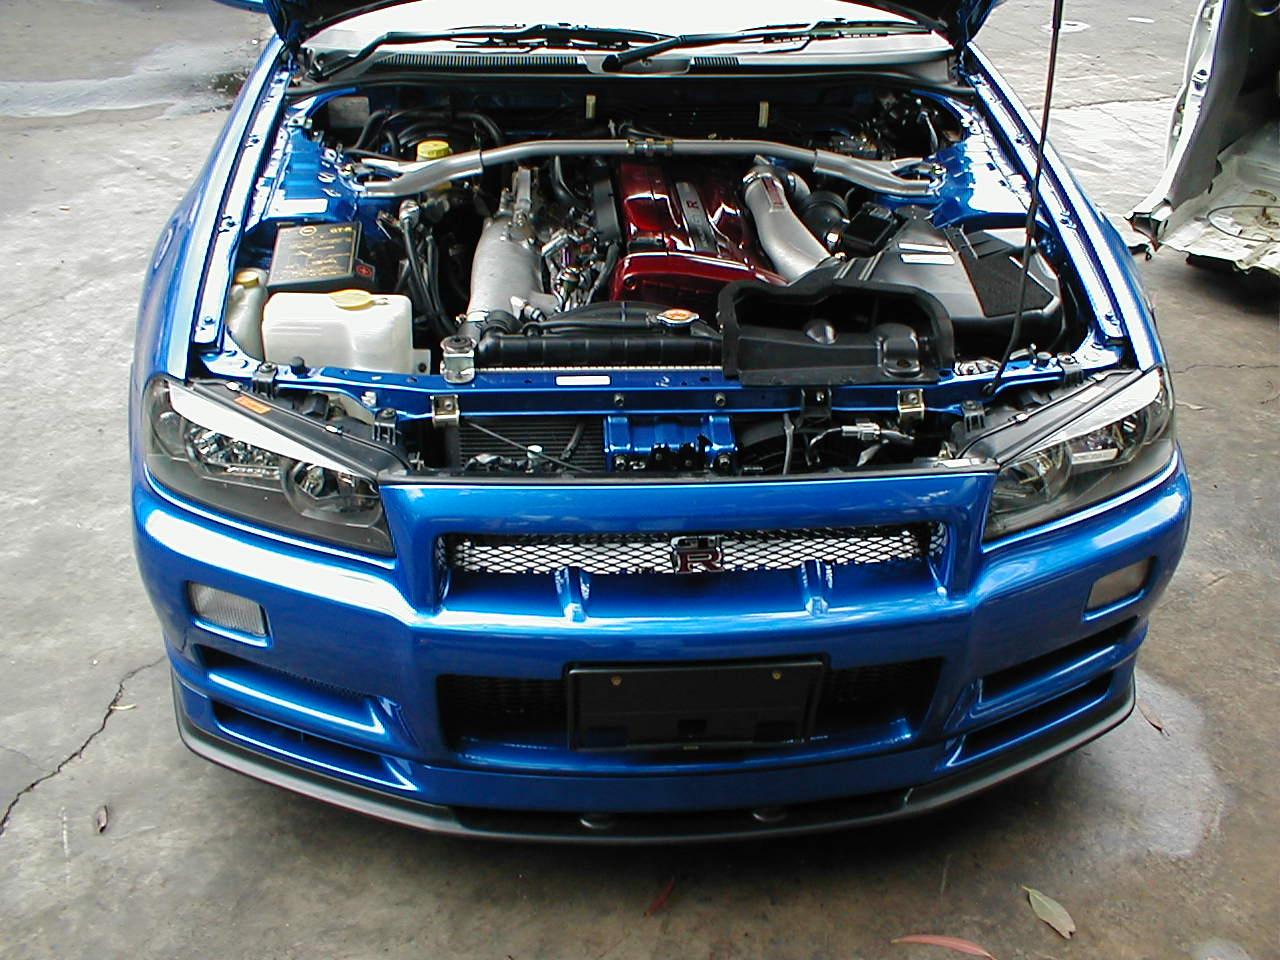 1999 Nissan Skyline R34 GTR